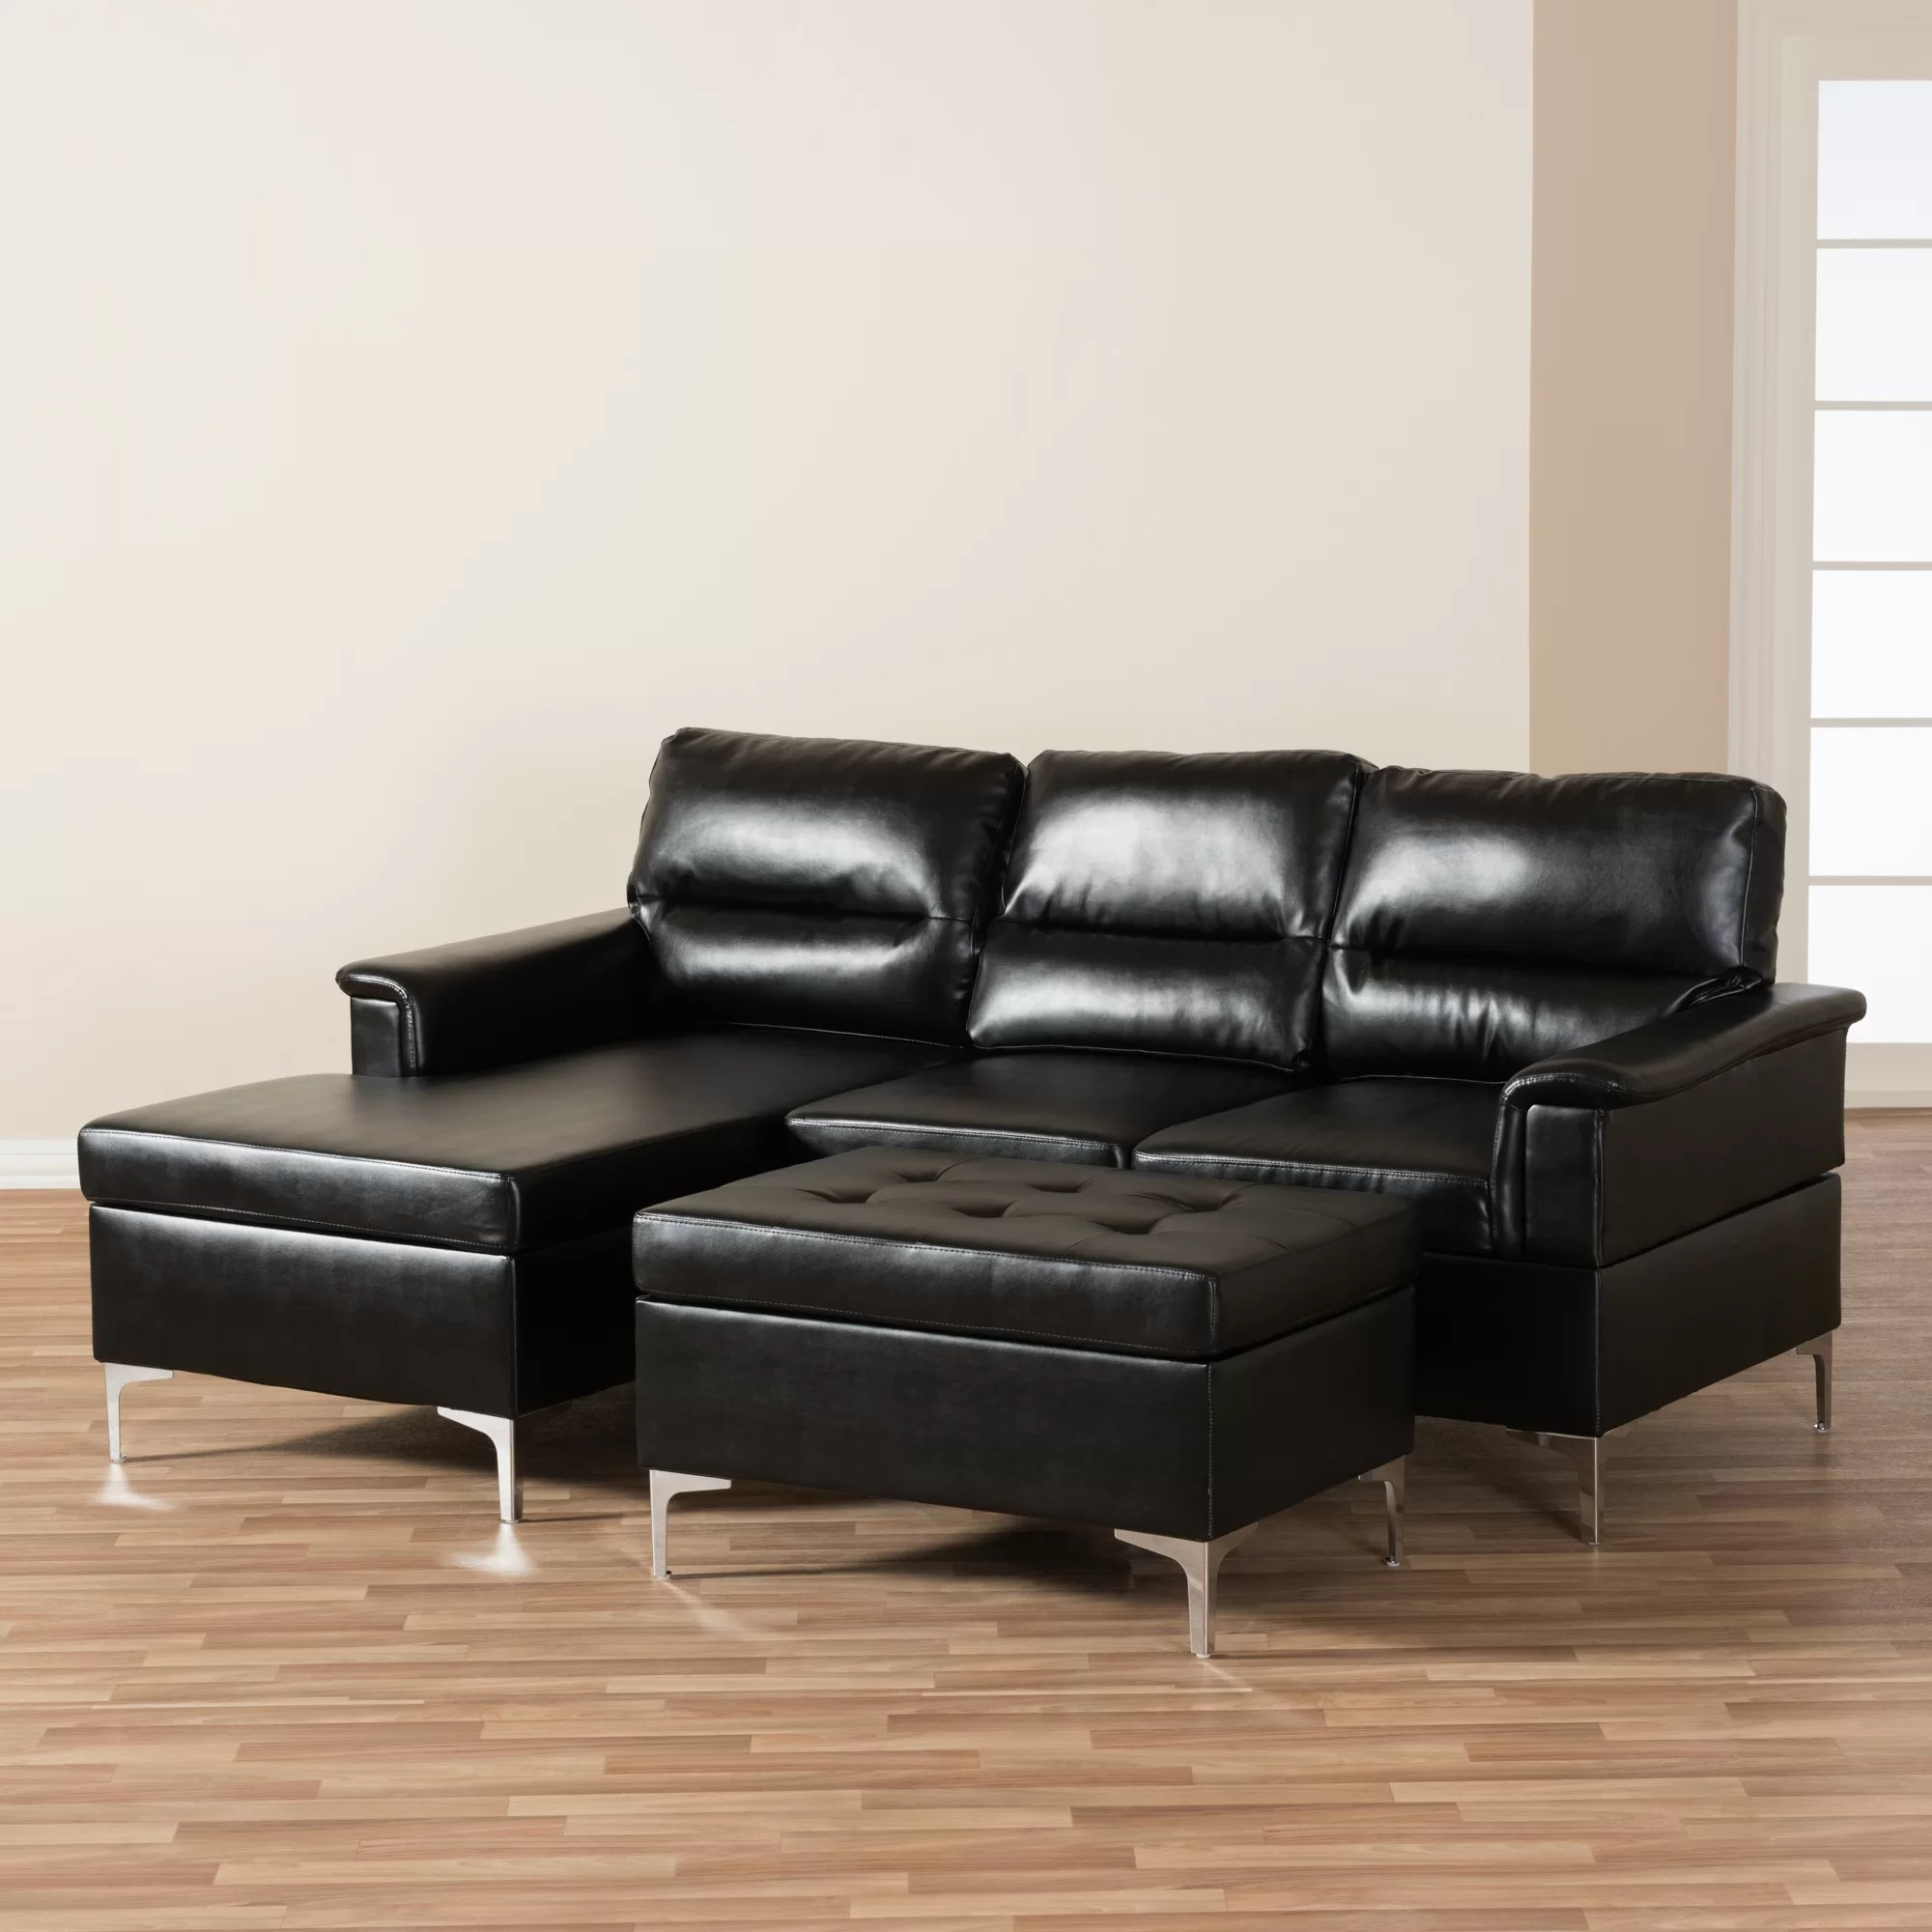 cheap faux leather sofa sets modern wood set wholesale interiors baxton studio teresa sectional